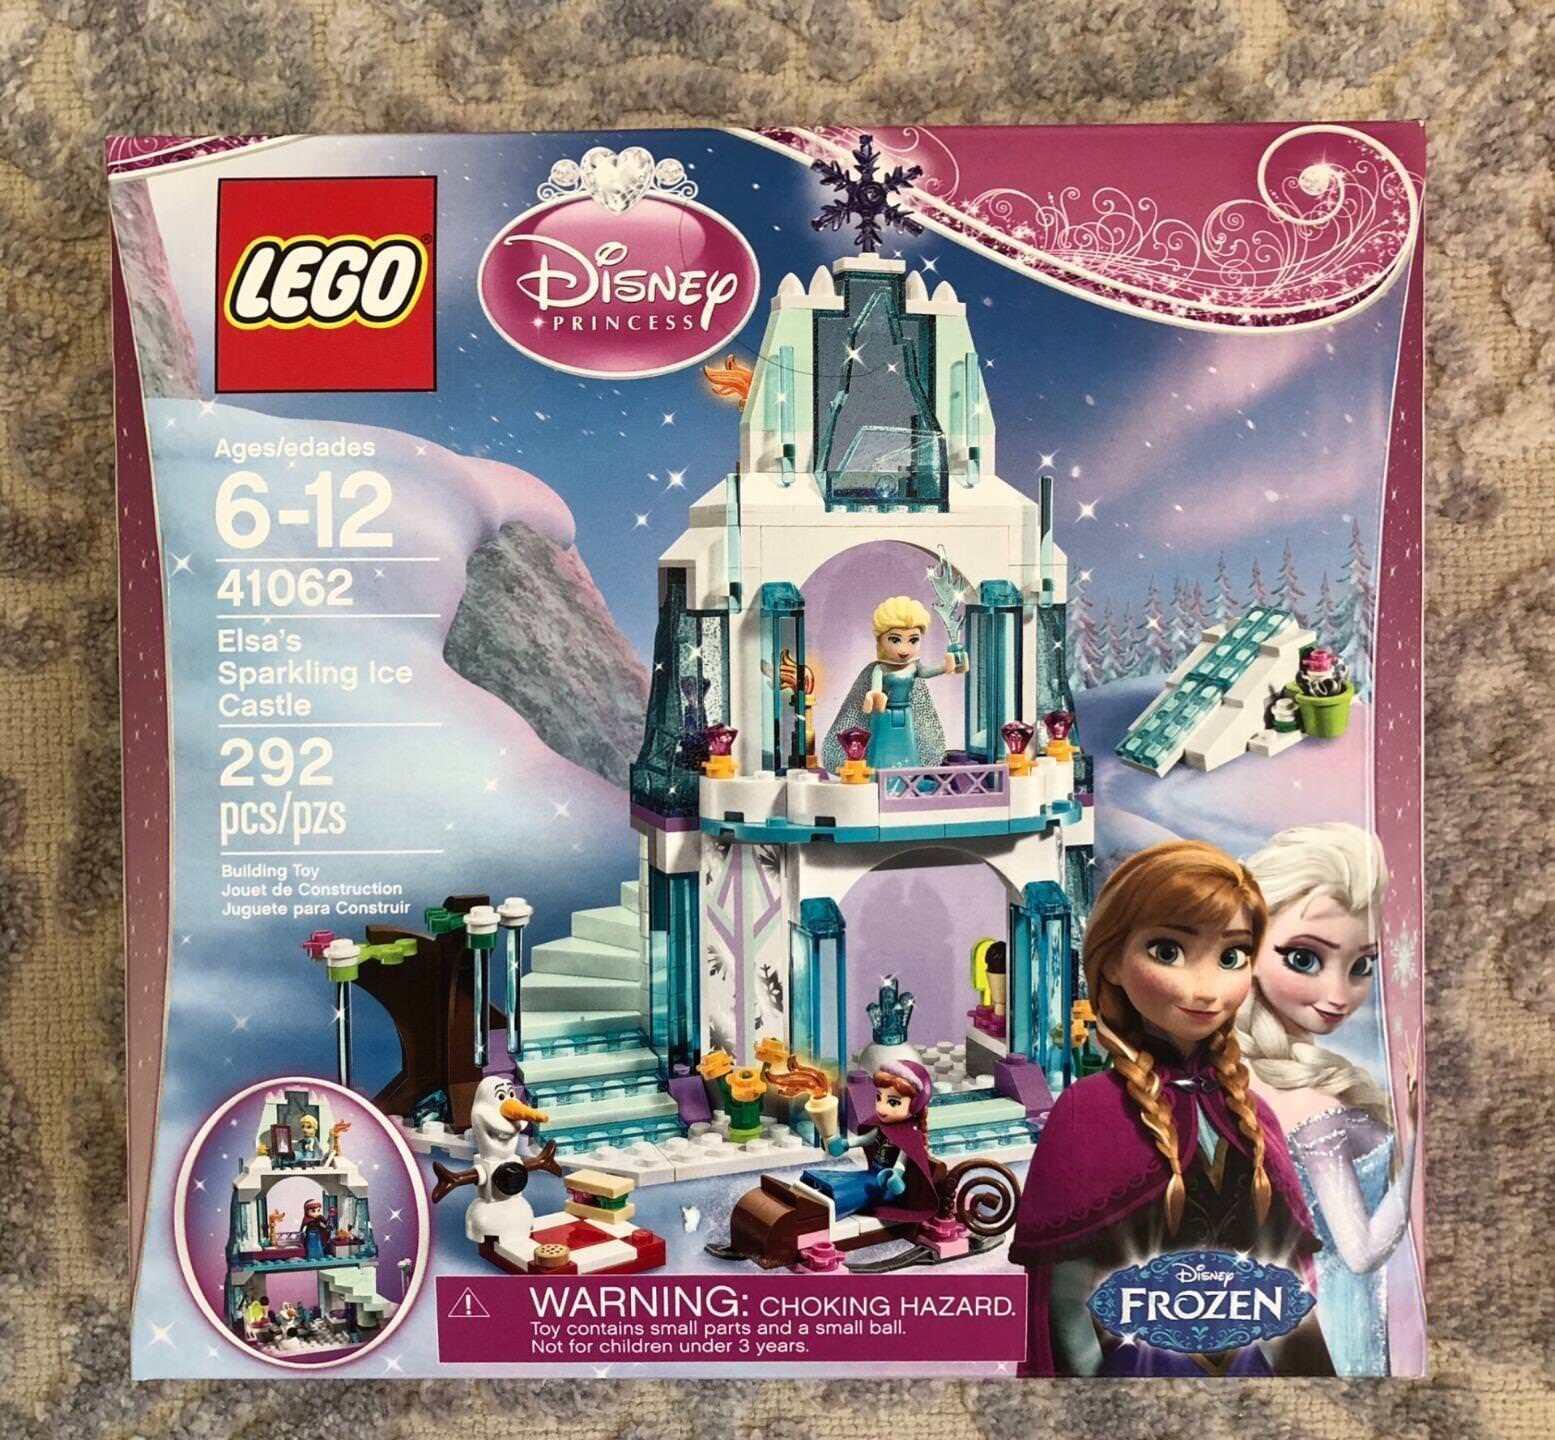 LEGO 41062 ELSA'S ELSA'S ELSA'S SPARKLING ICE CASTLE/ MIB sealed/ 292 pieces /RETIrosso 51358c